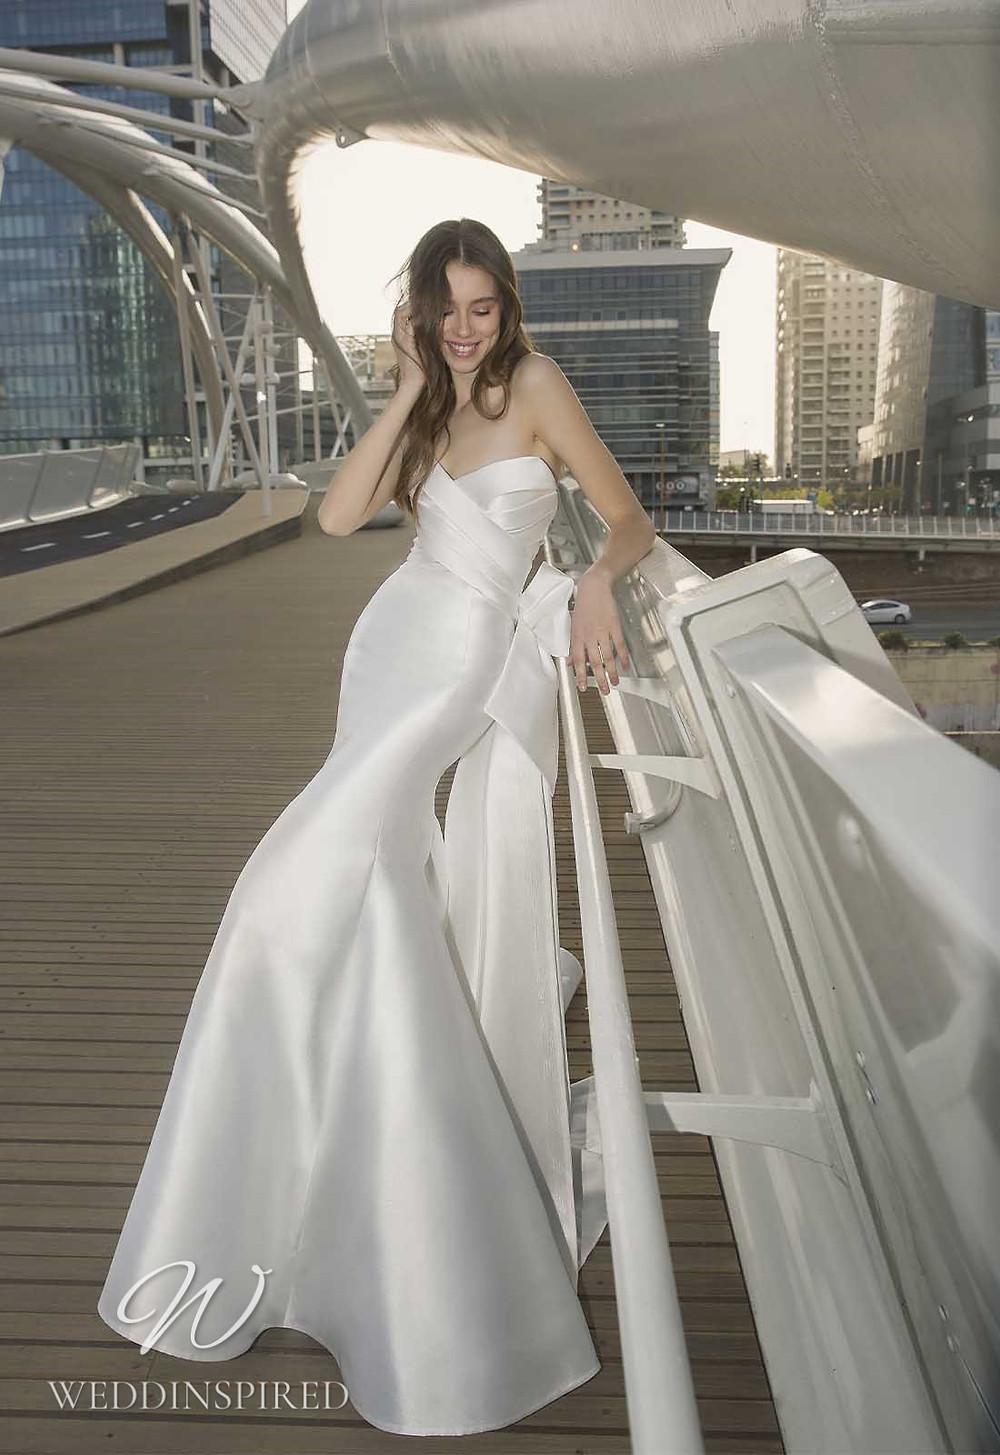 A Pnina Tornai 2021 strapless satin mermaid wedding dress